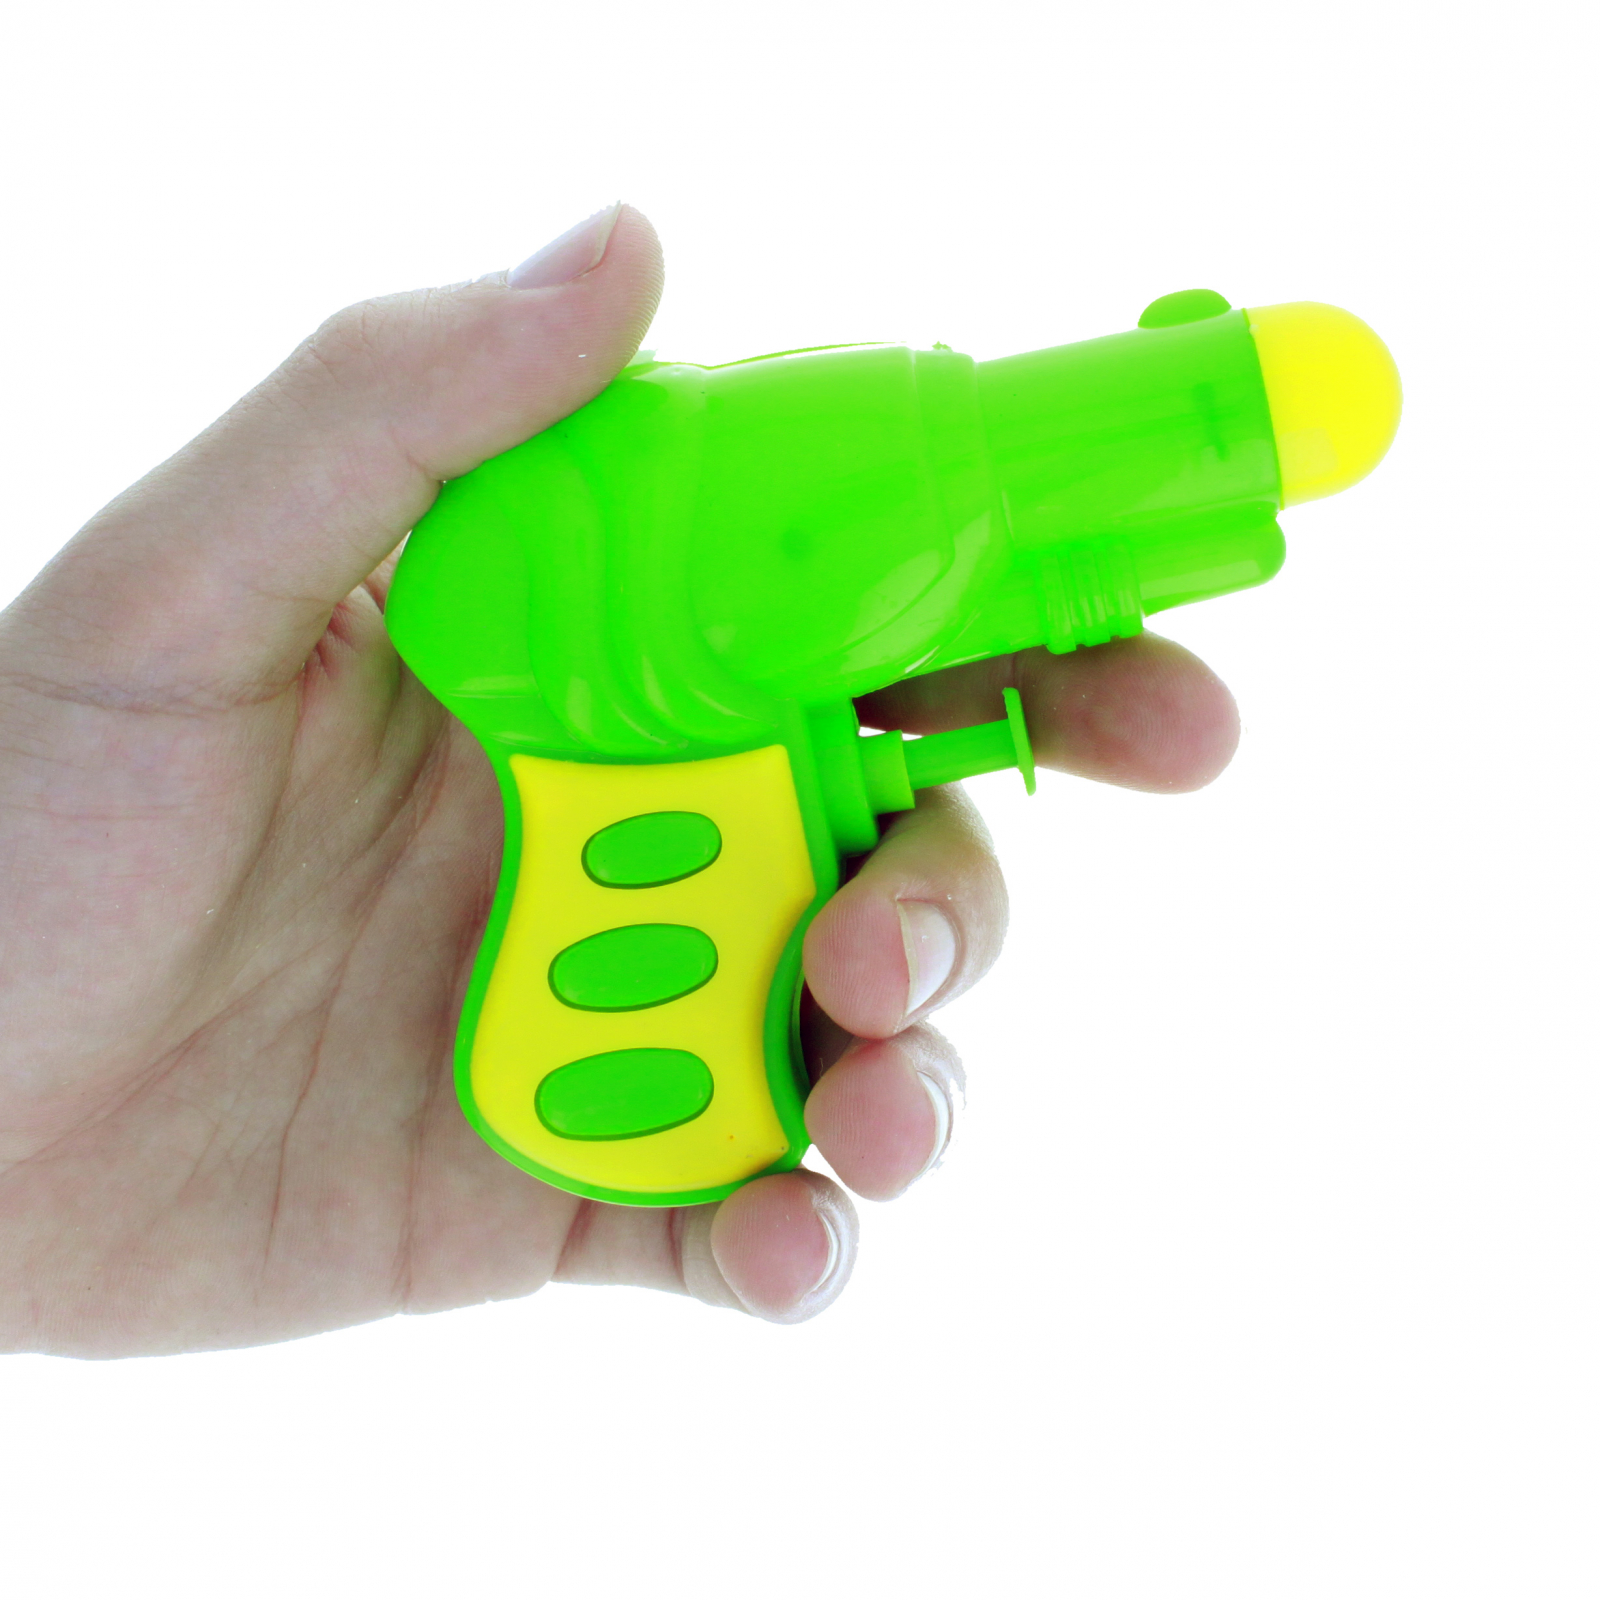 KidPlay Products Aqua Storm 12 Pack Water Gun